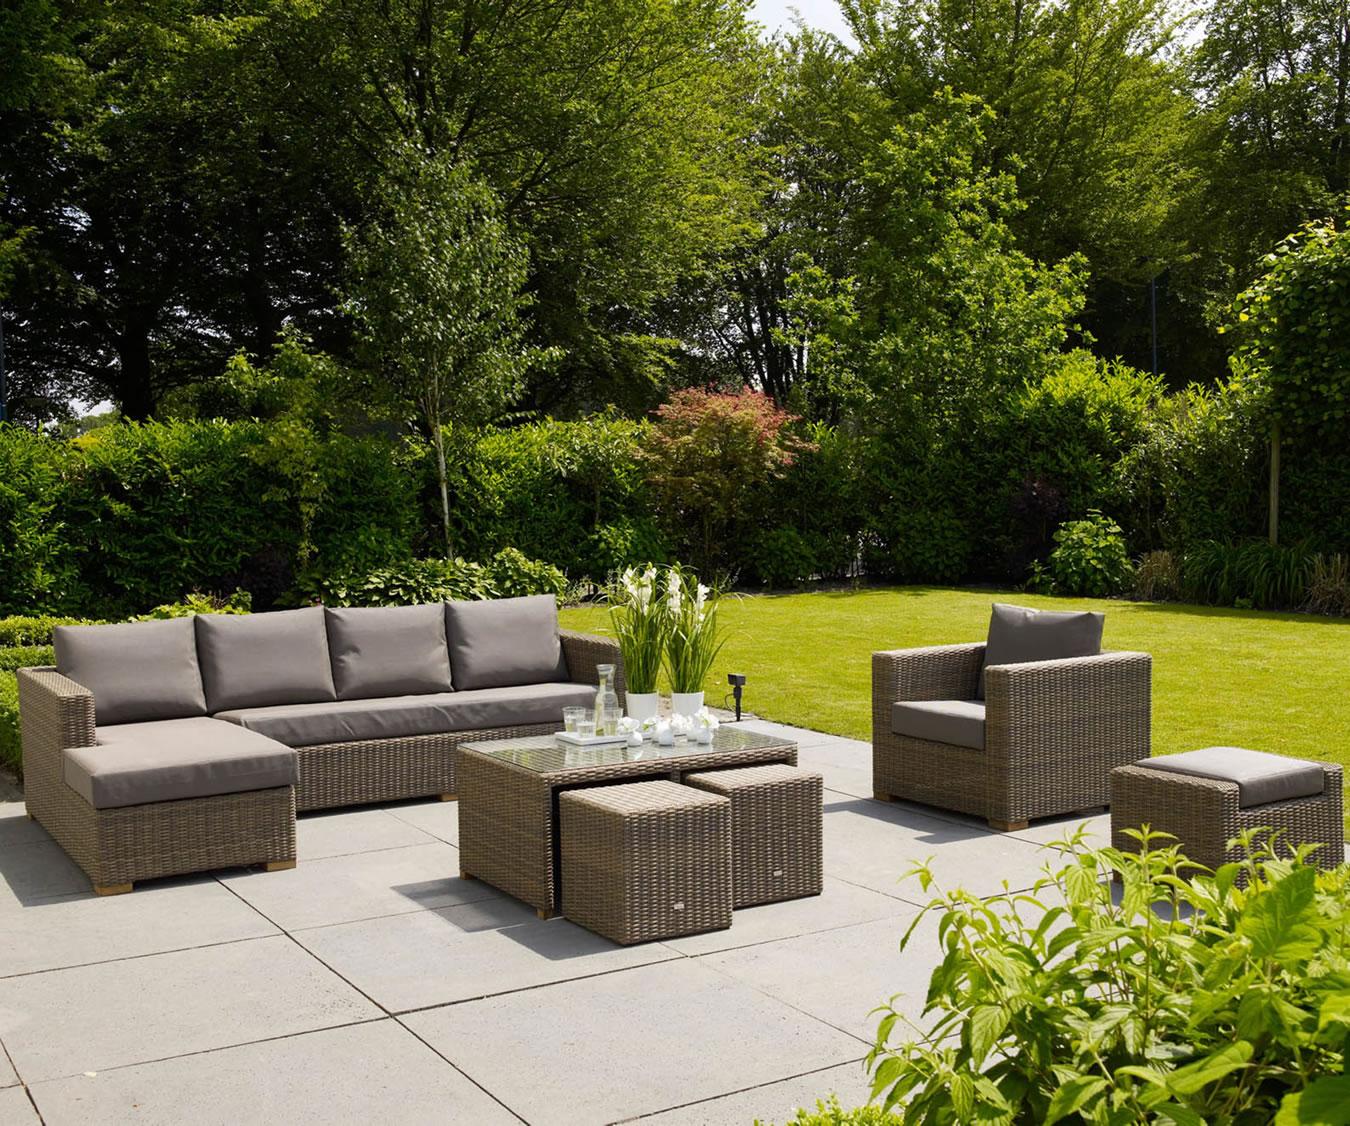 Moray Garden Chaise Lounge Sofa Furniture Set 163 2500